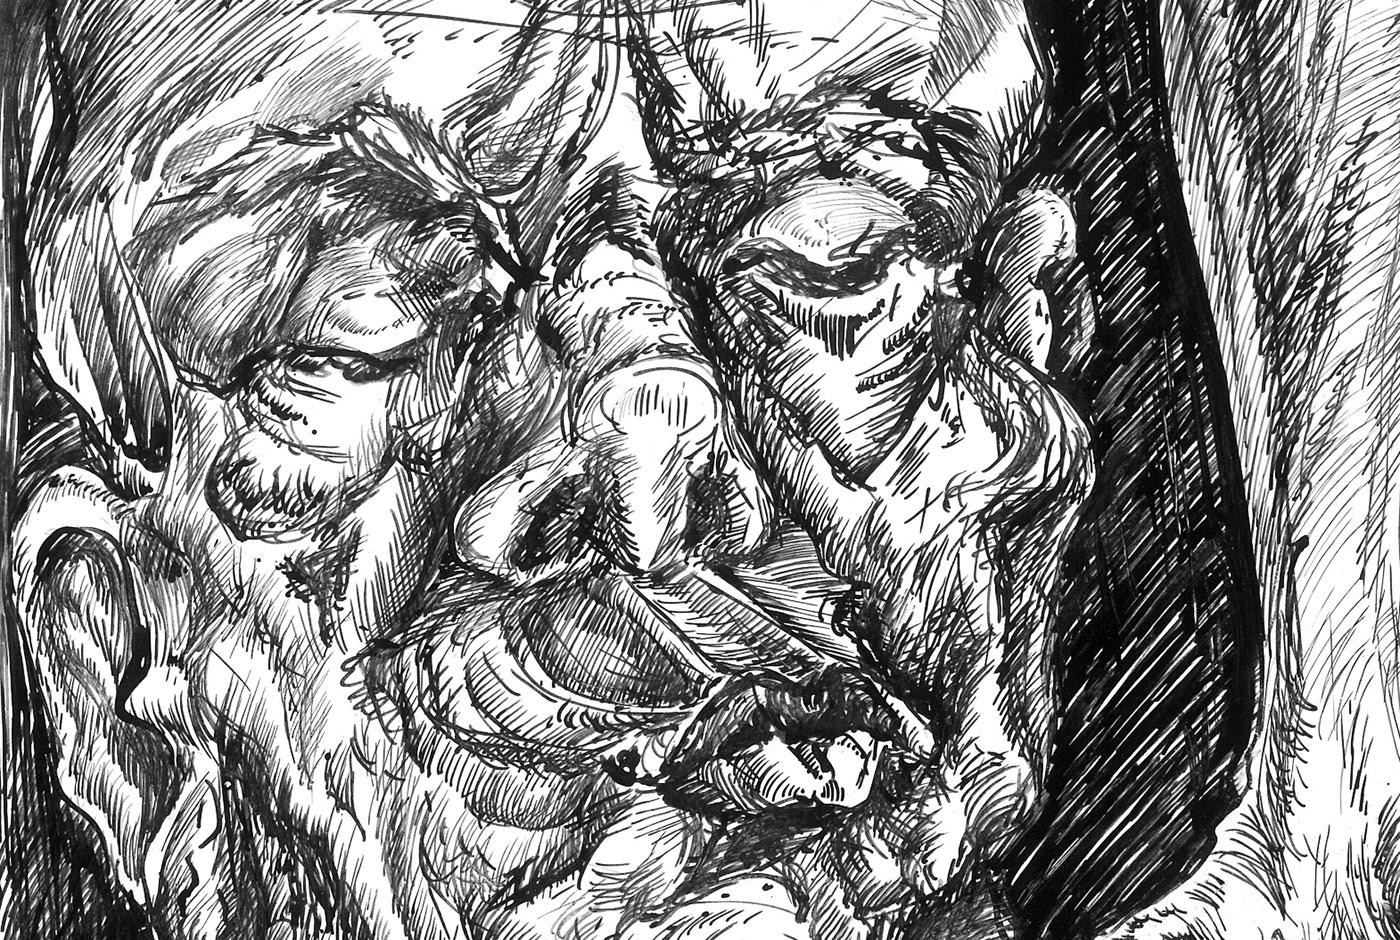 ink artwork invasion Emotional psychology philosophy  grotesque surrealism ILLUSTRATION  memories